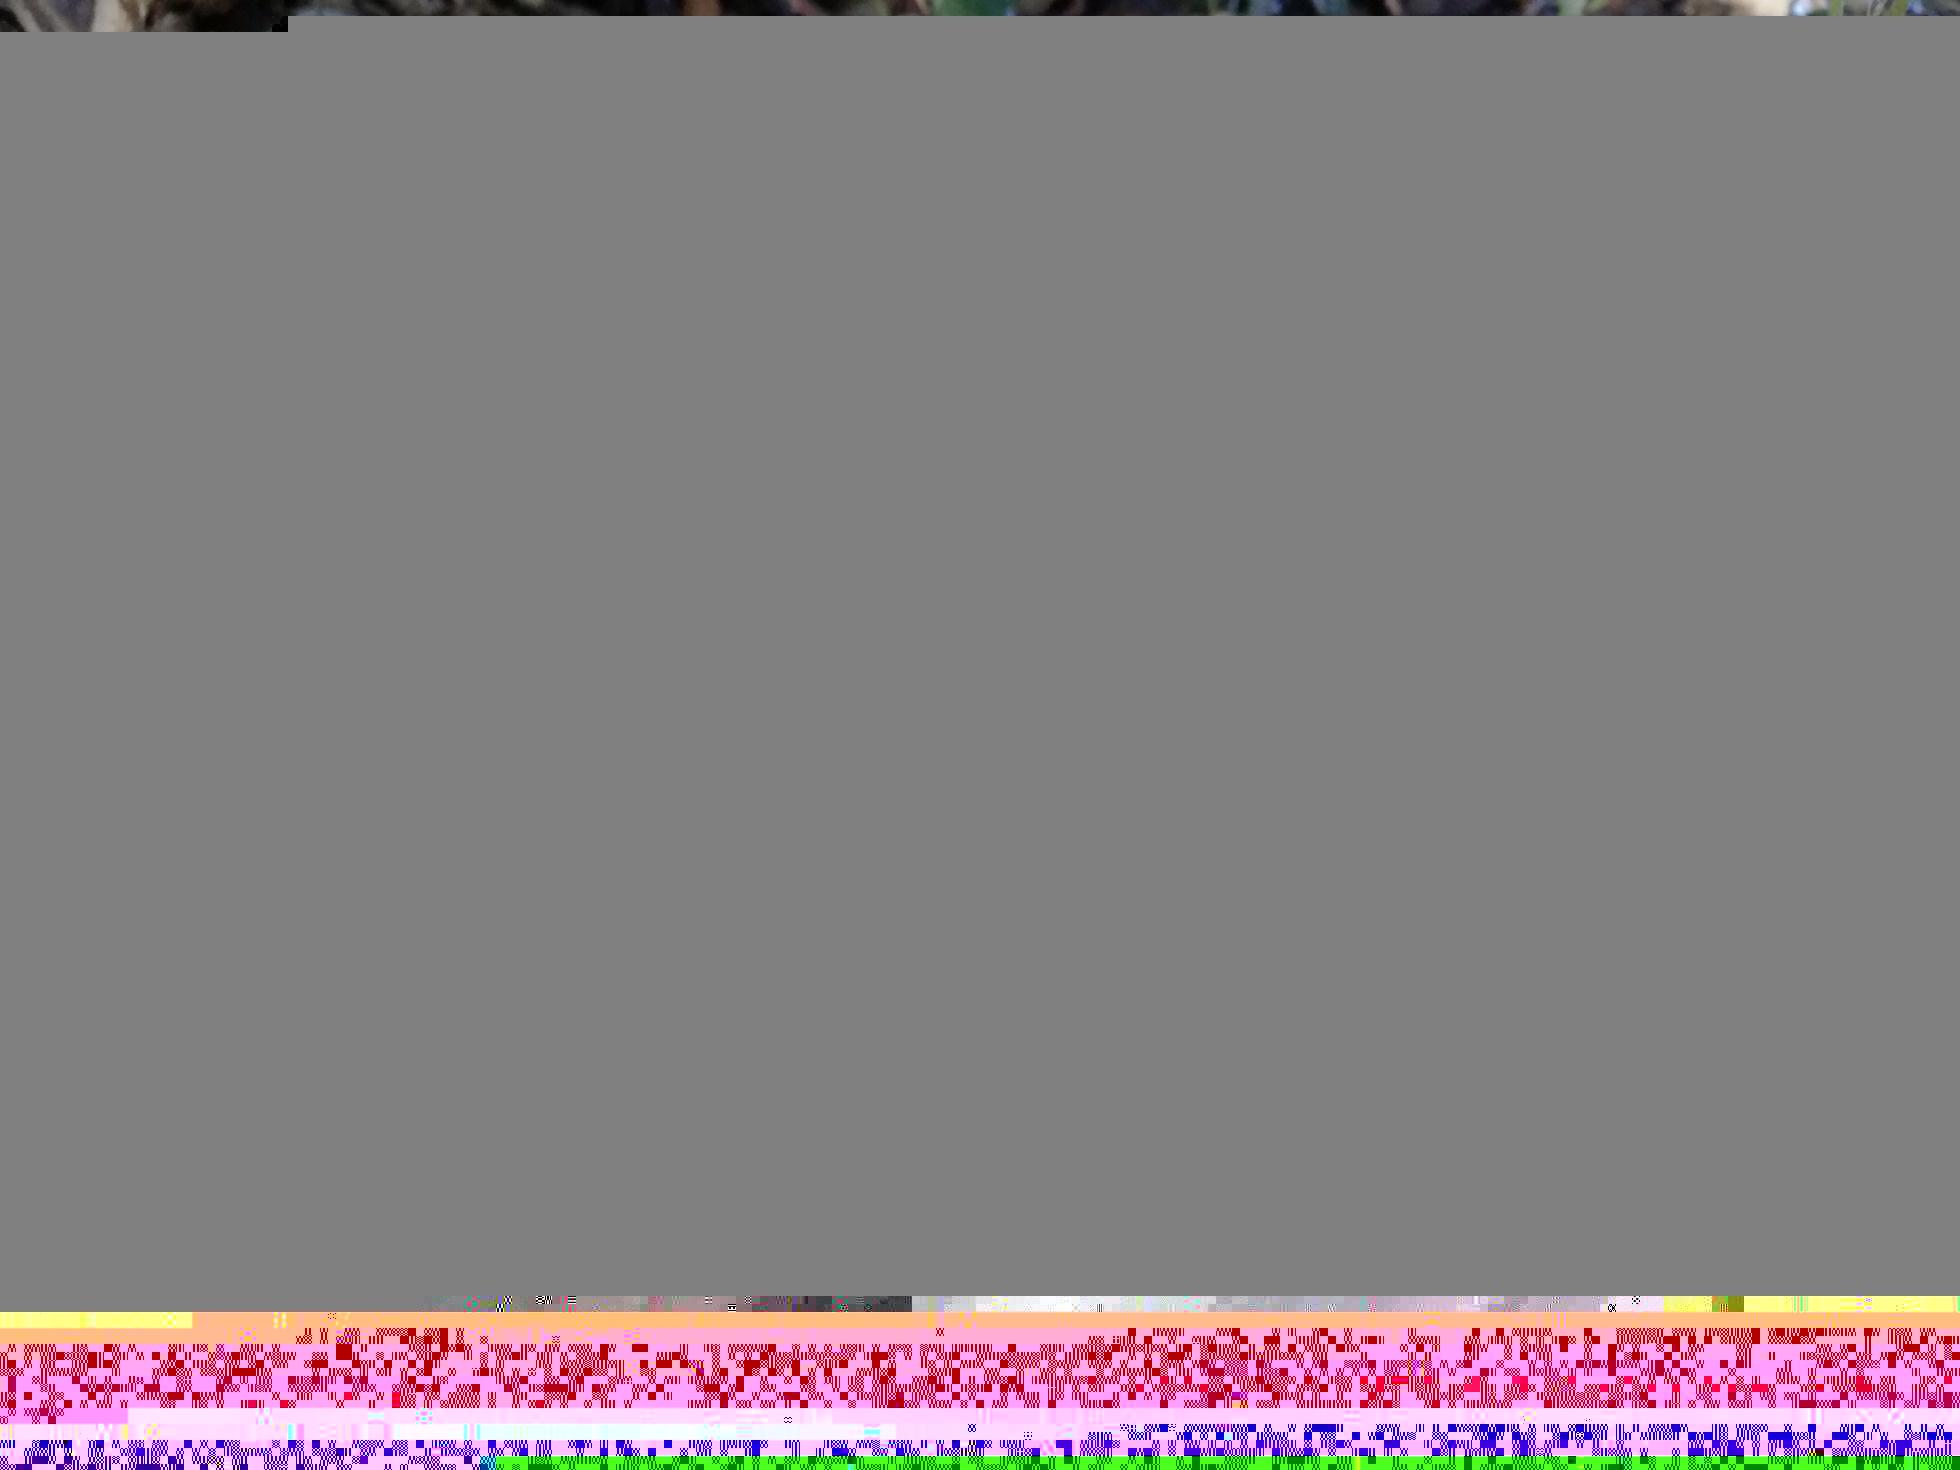 IMG_20181123_115847_2018-11-25-2.jpg